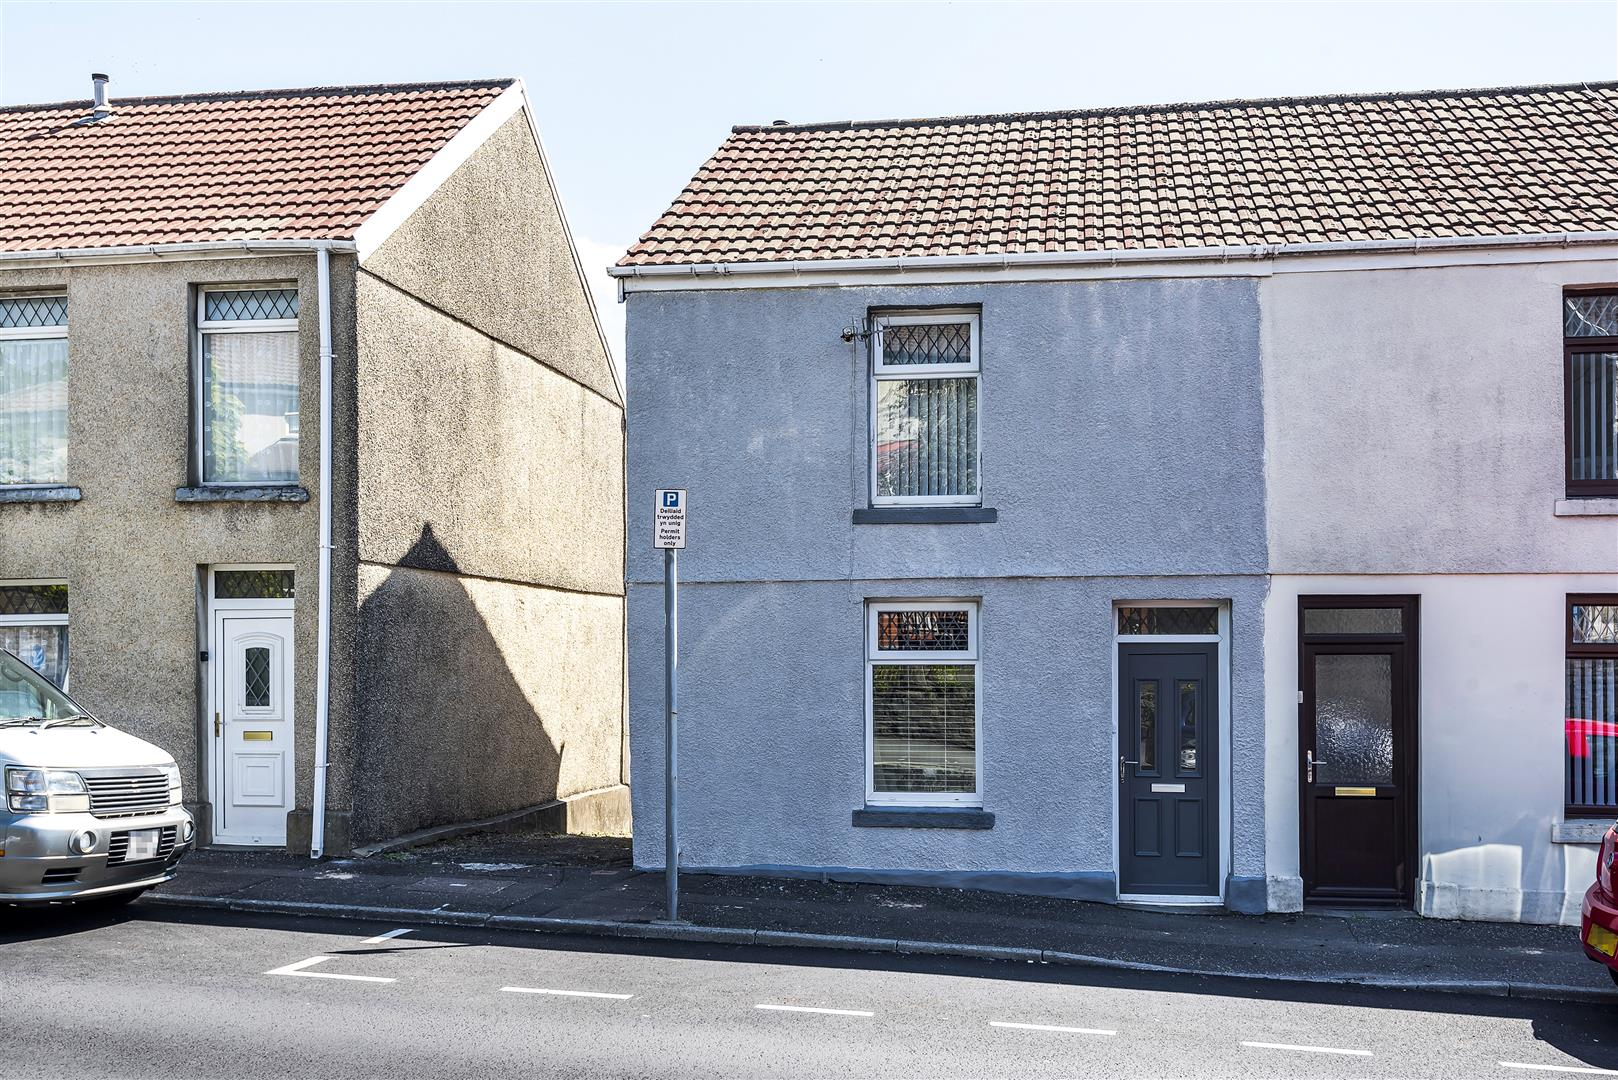 Martin Street, Morriston, Swansea, SA6 7BJ